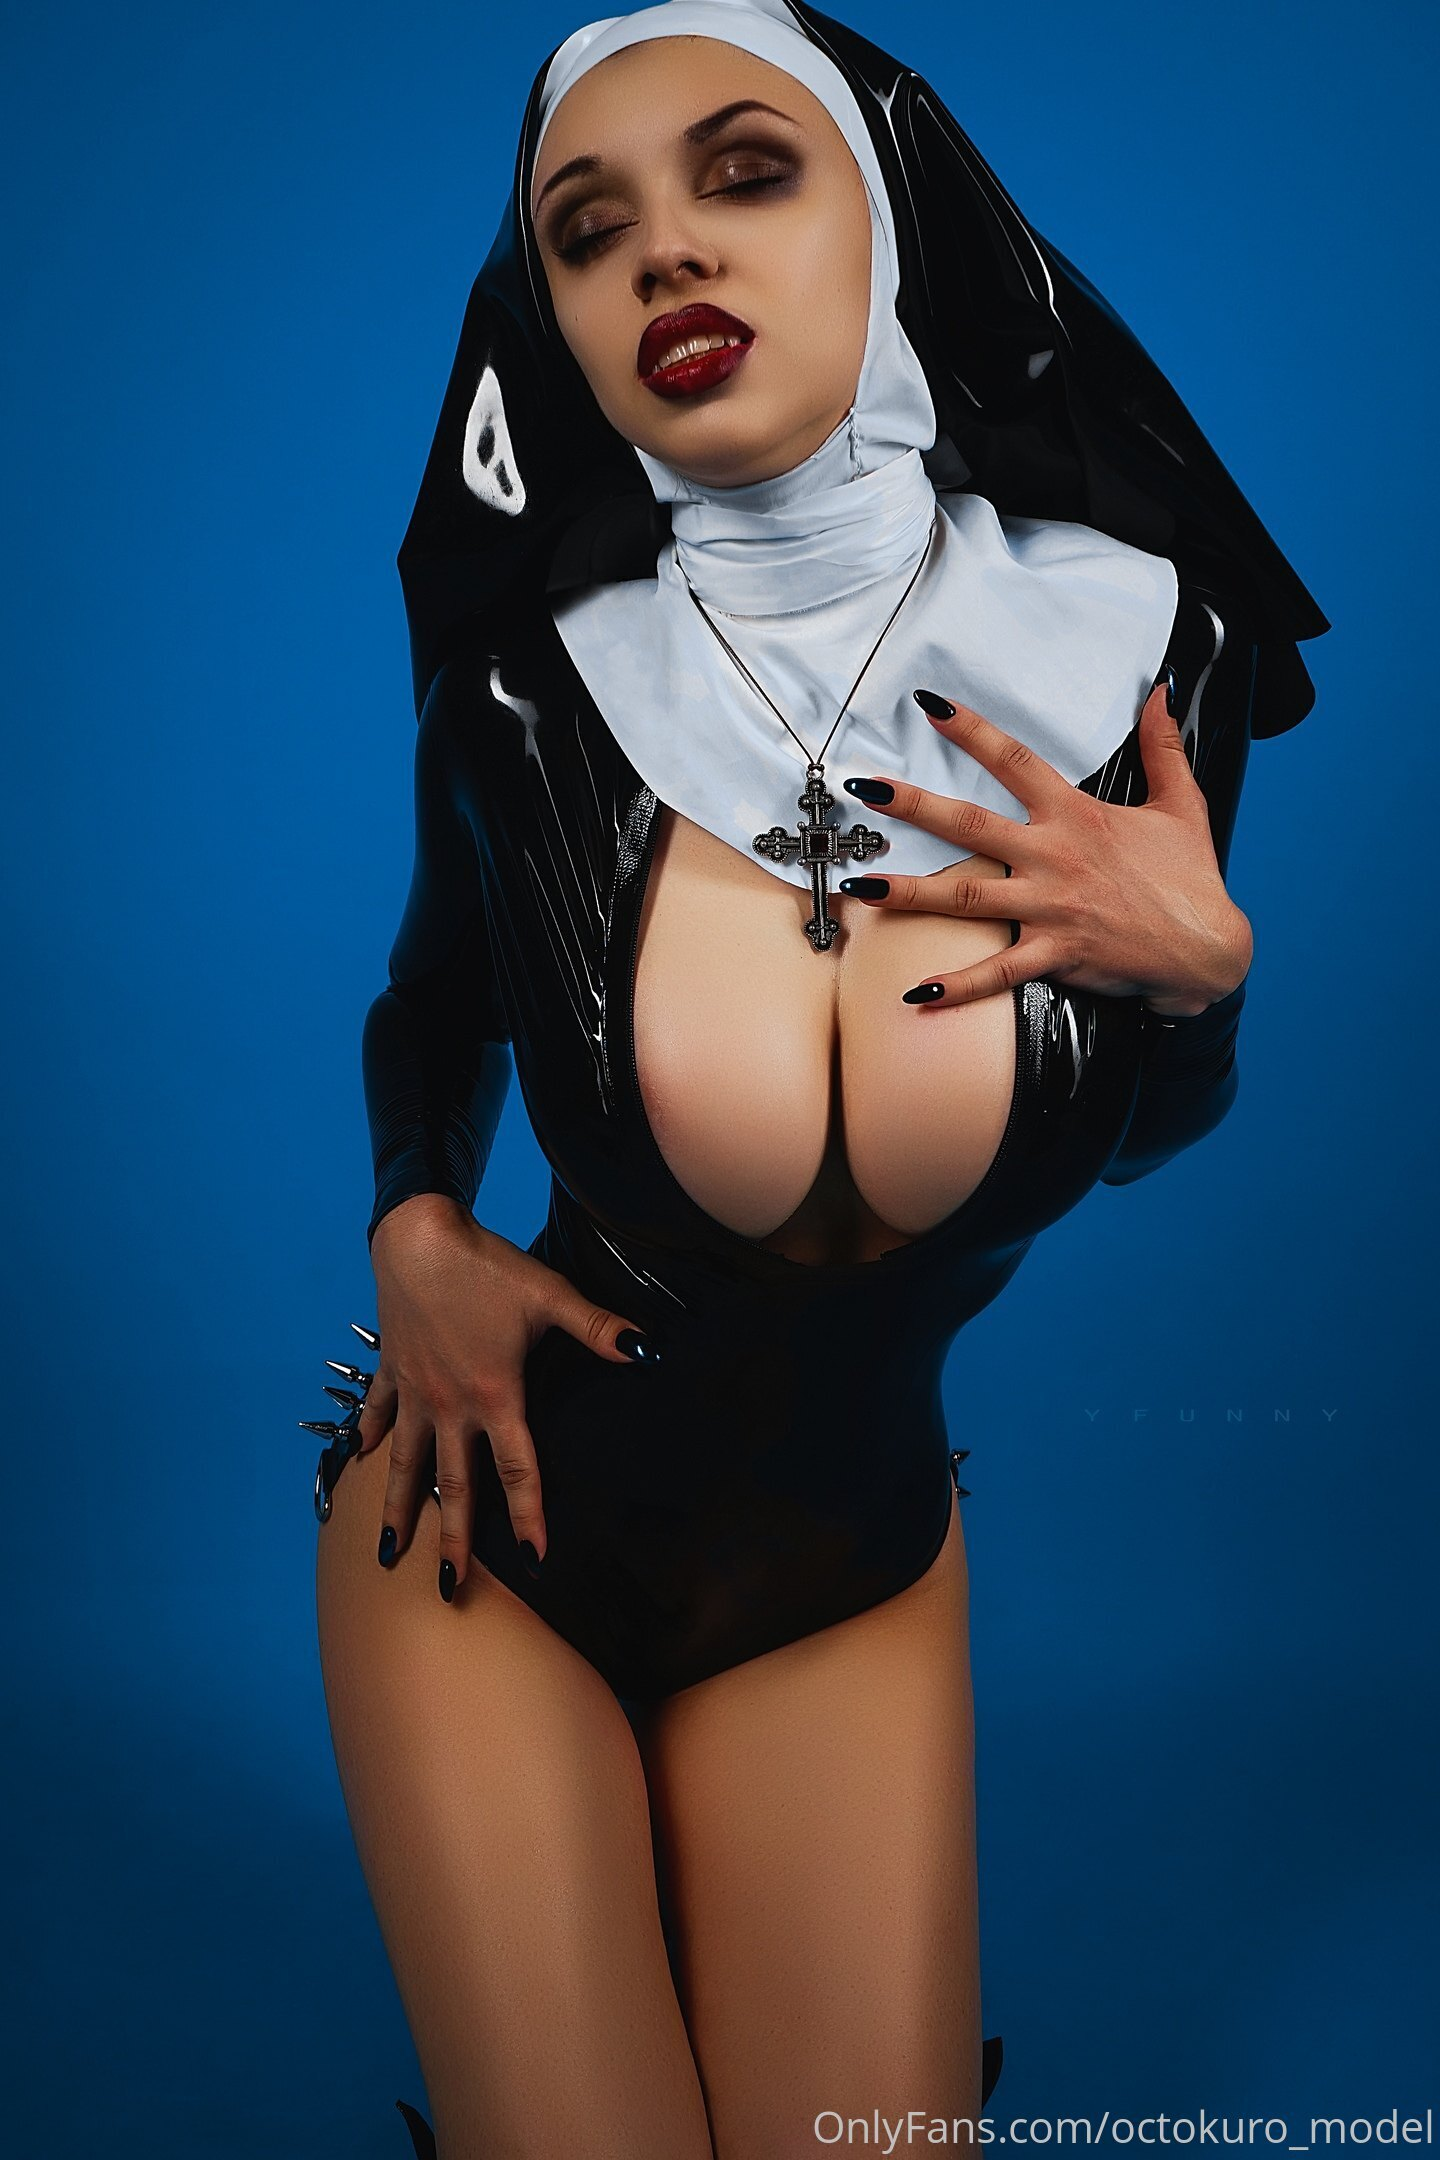 Tetonas cosplayer - Fotos Desnudos y sexo Gratis